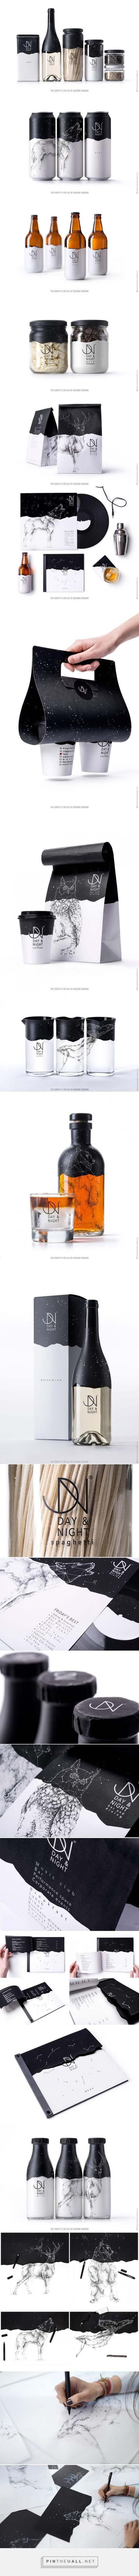 Day & Night packaging designed by Backbone Branding (Armenia) - http://www.packagingoftheworld.com/2016/03/day-night.html Plus de découvertes sur Le Blog des Tendances.fr #tendance #packaging #blogueur